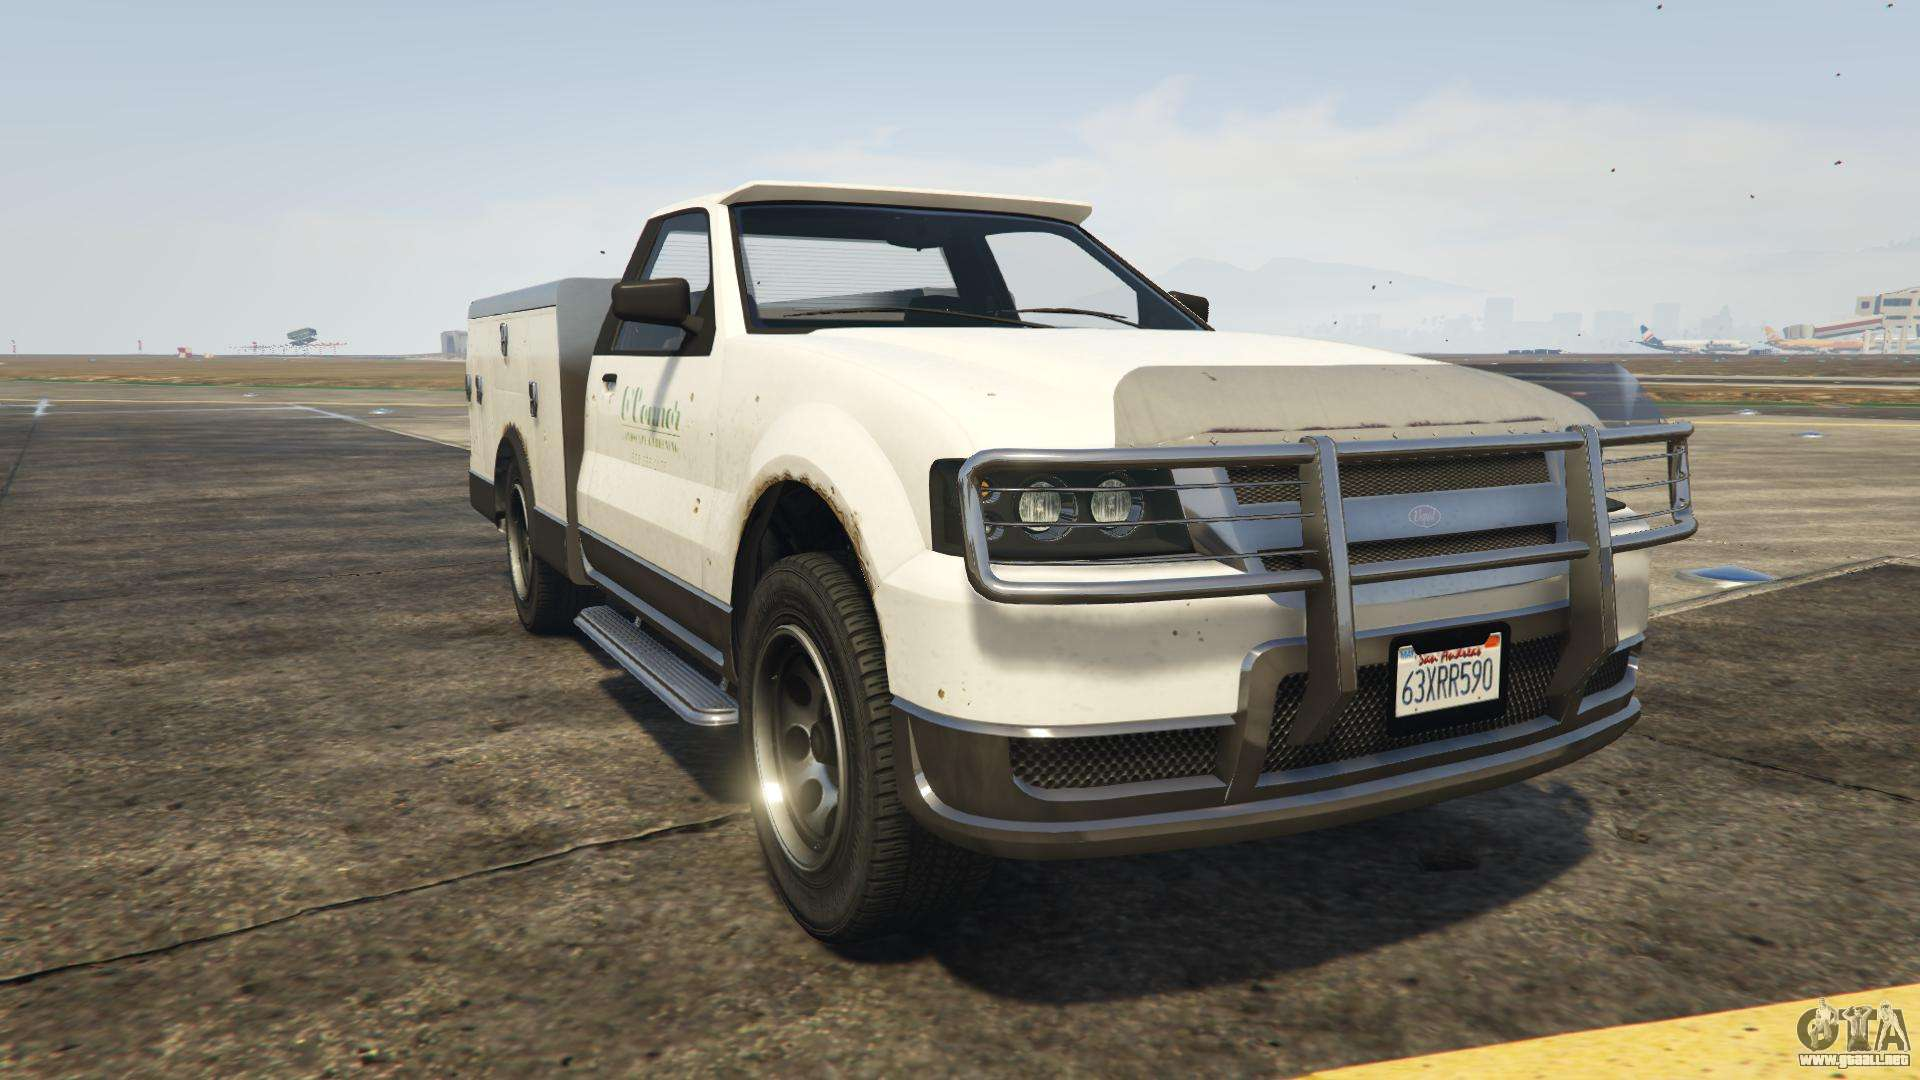 GTA 5 Vapid Utility Truck - vista frontal